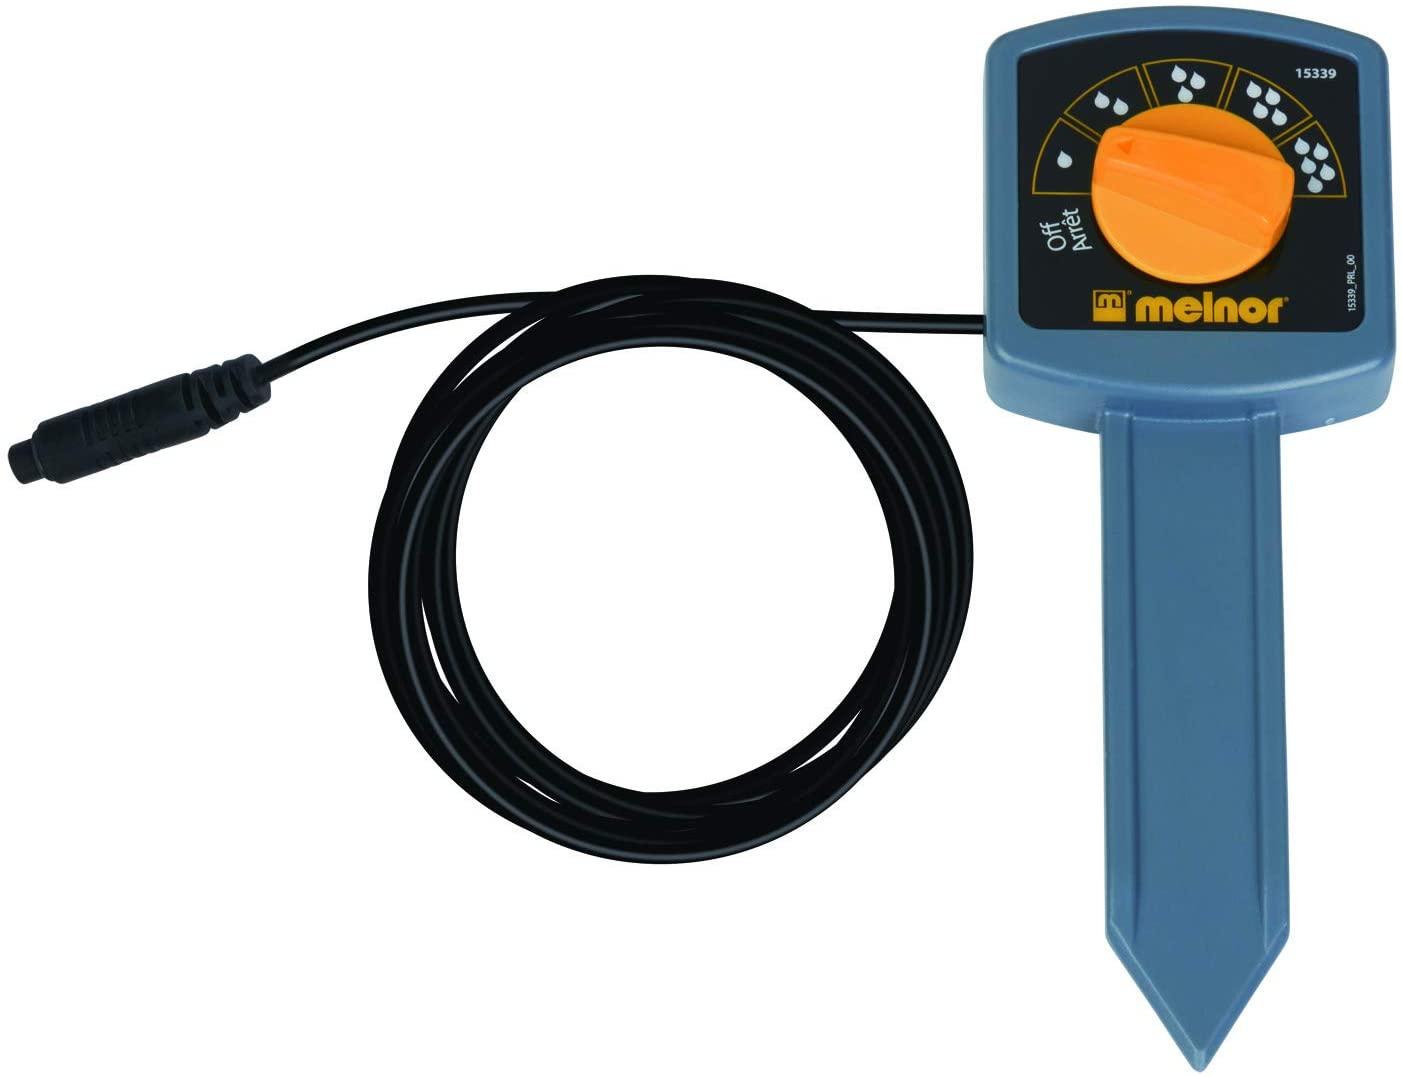 Melnor 65072-AMZ Hydrologic Soil Moisture Sensor